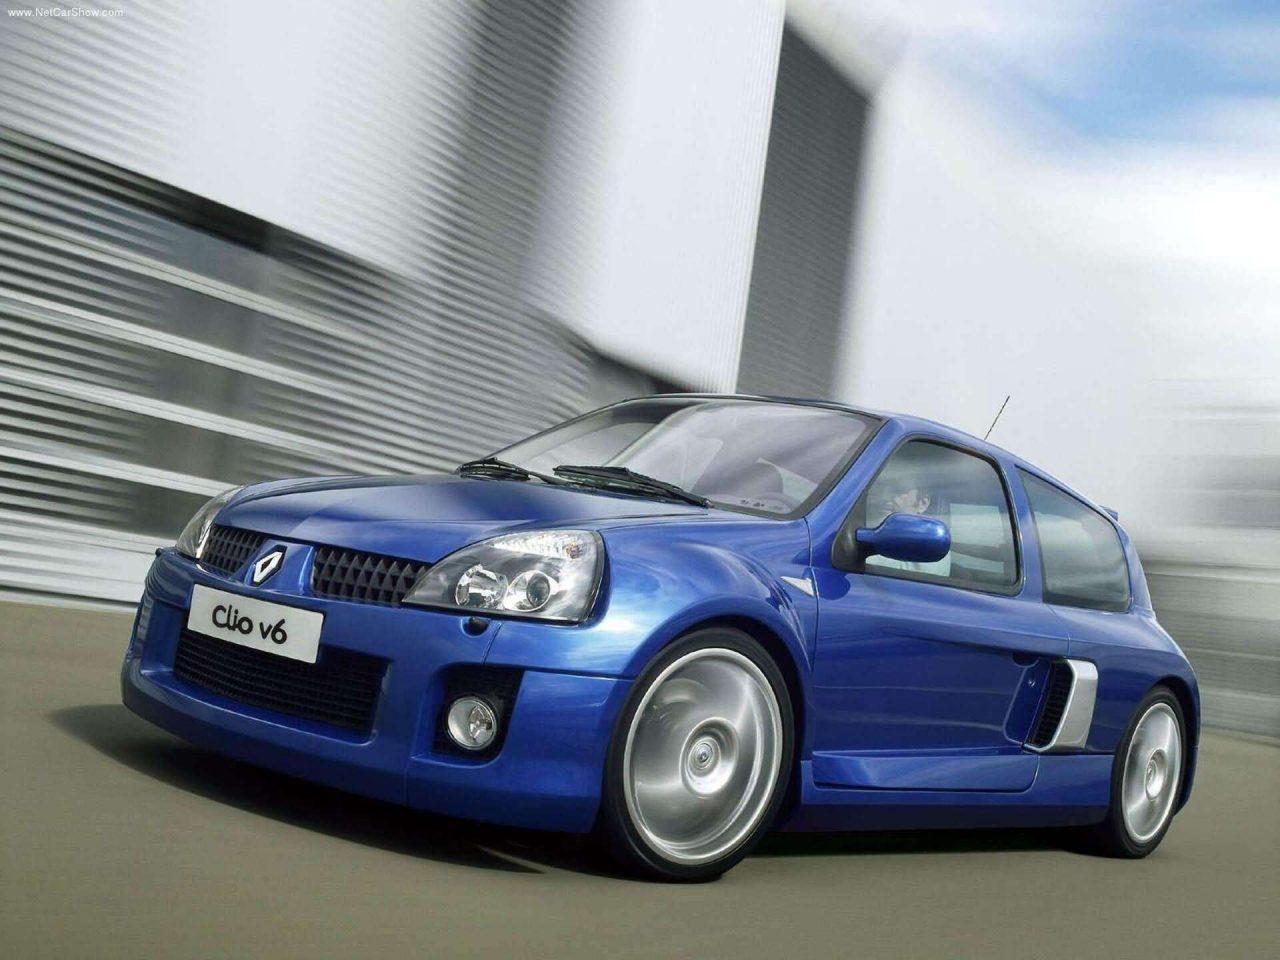 Renault Clio V6, la bestia gala celebra su 20º aniversario